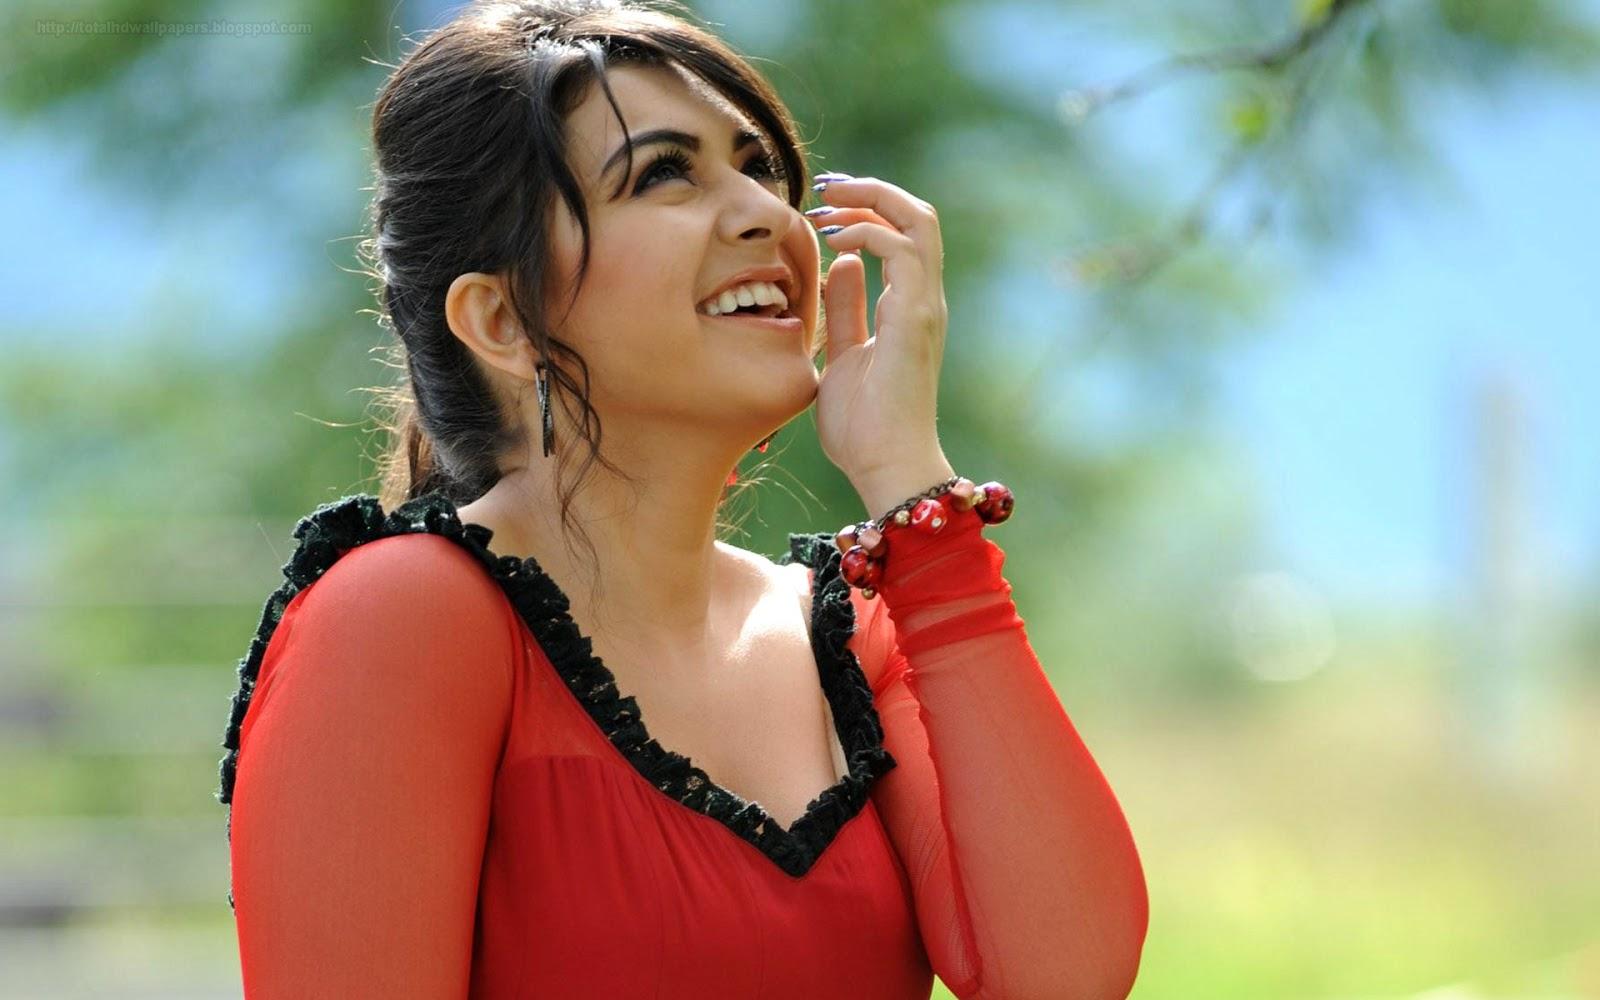 Bollywood Actress HD Wallpapers Hollywood Actress HD Wallpapers South indian Actress HD ...